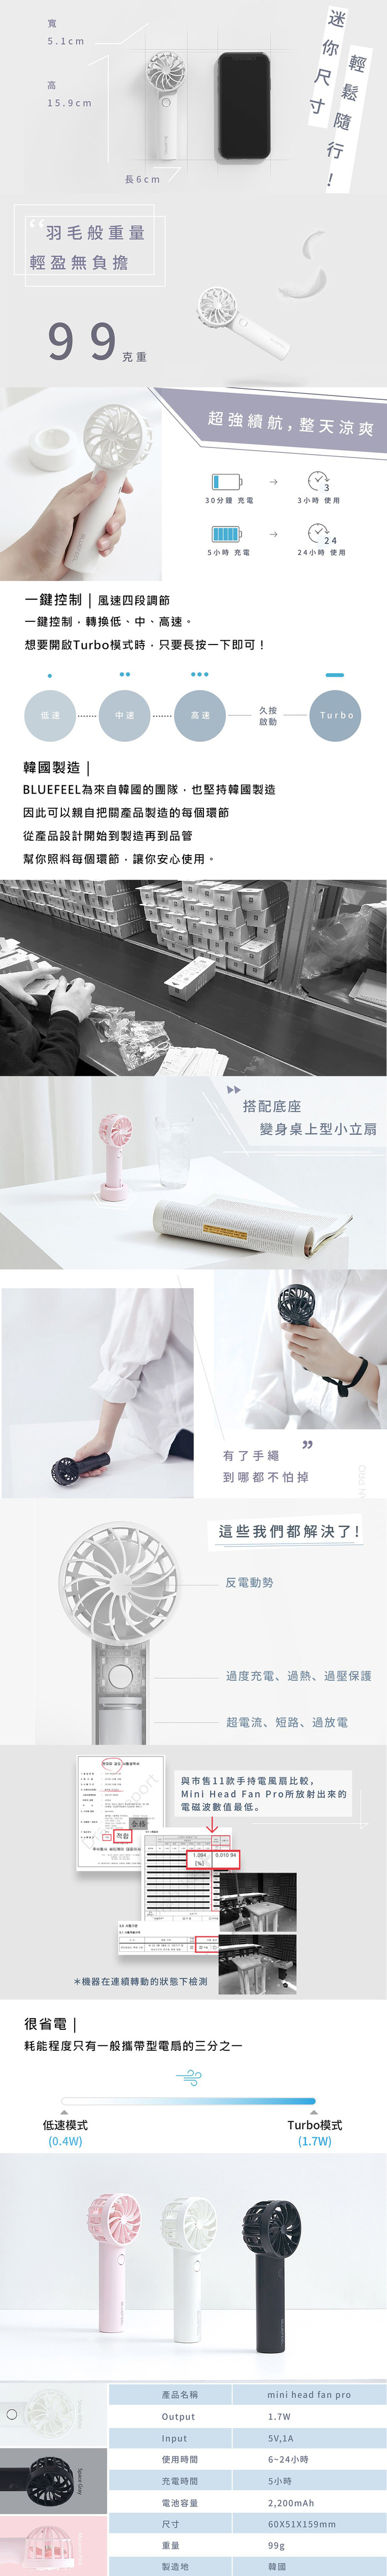 Bluefeel|USB韓國極輕手持強力小風扇(三色可選)